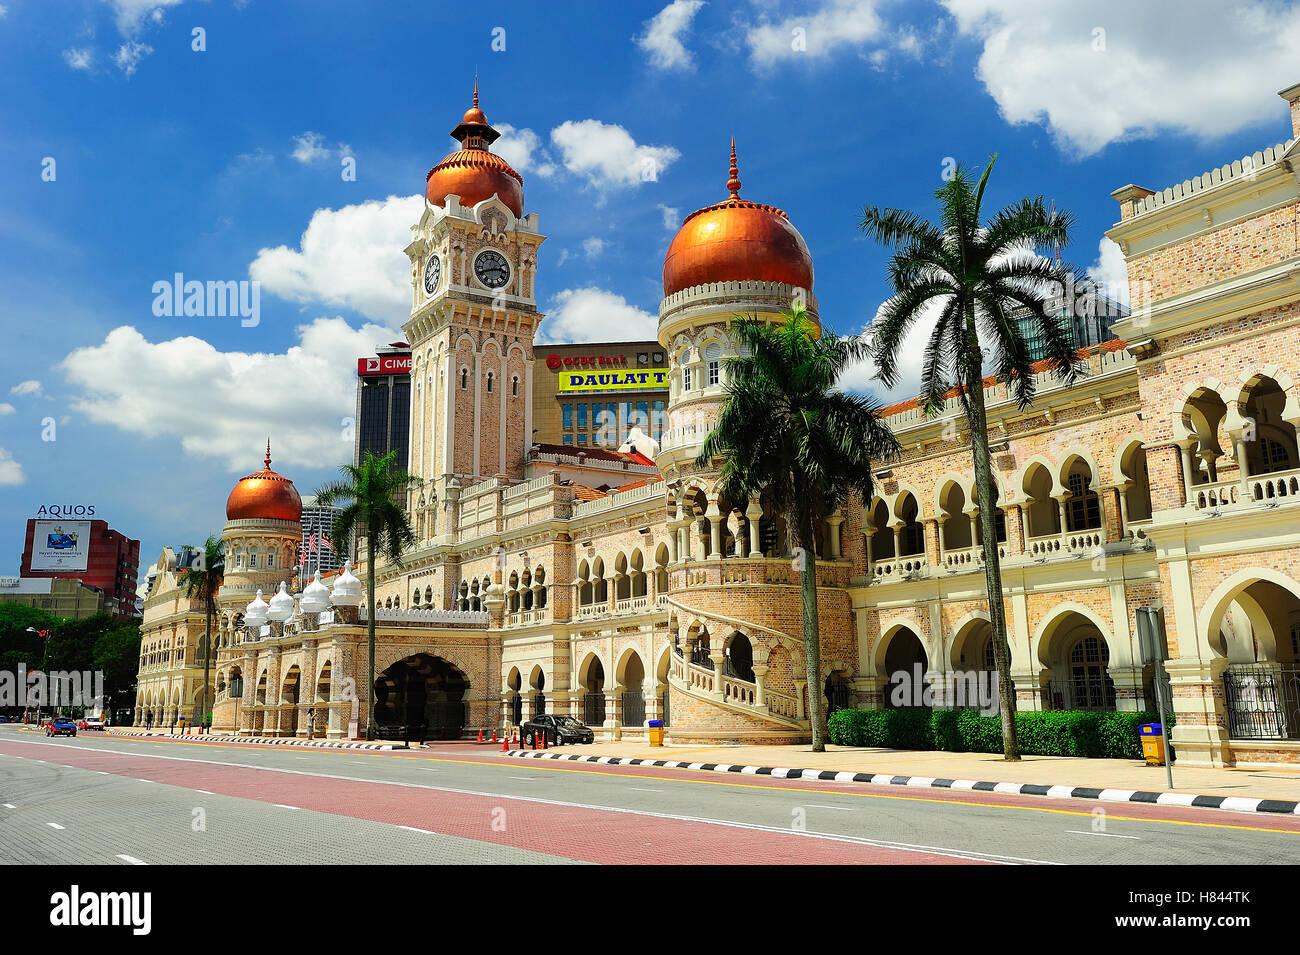 Sultan Abdul Samad Building Kuala Lumpur Malaysia Stock Photo Alamy